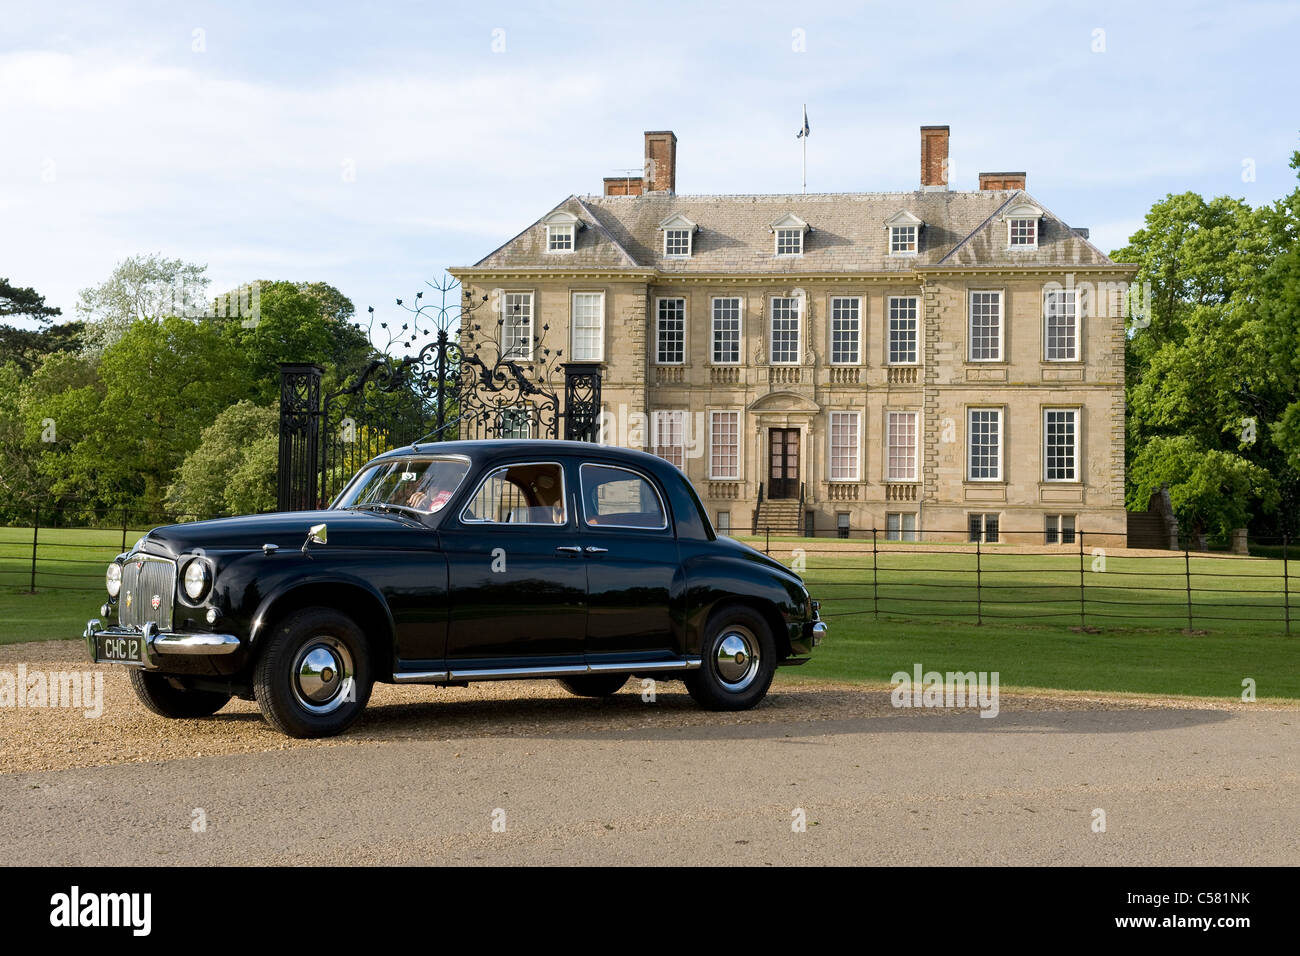 Oldtimer Rover 75 P4 motor vor Stanford Hall, Leicestershire, UK Stockbild